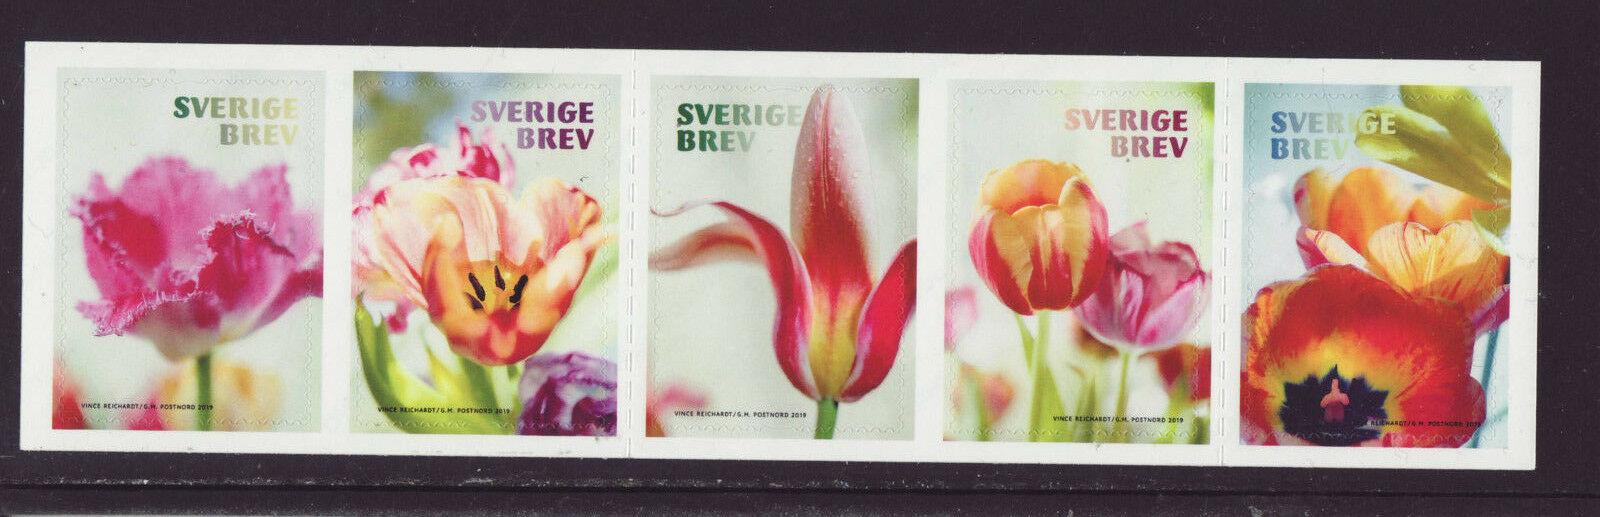 Sweden- Tulips (January 10, 2019)